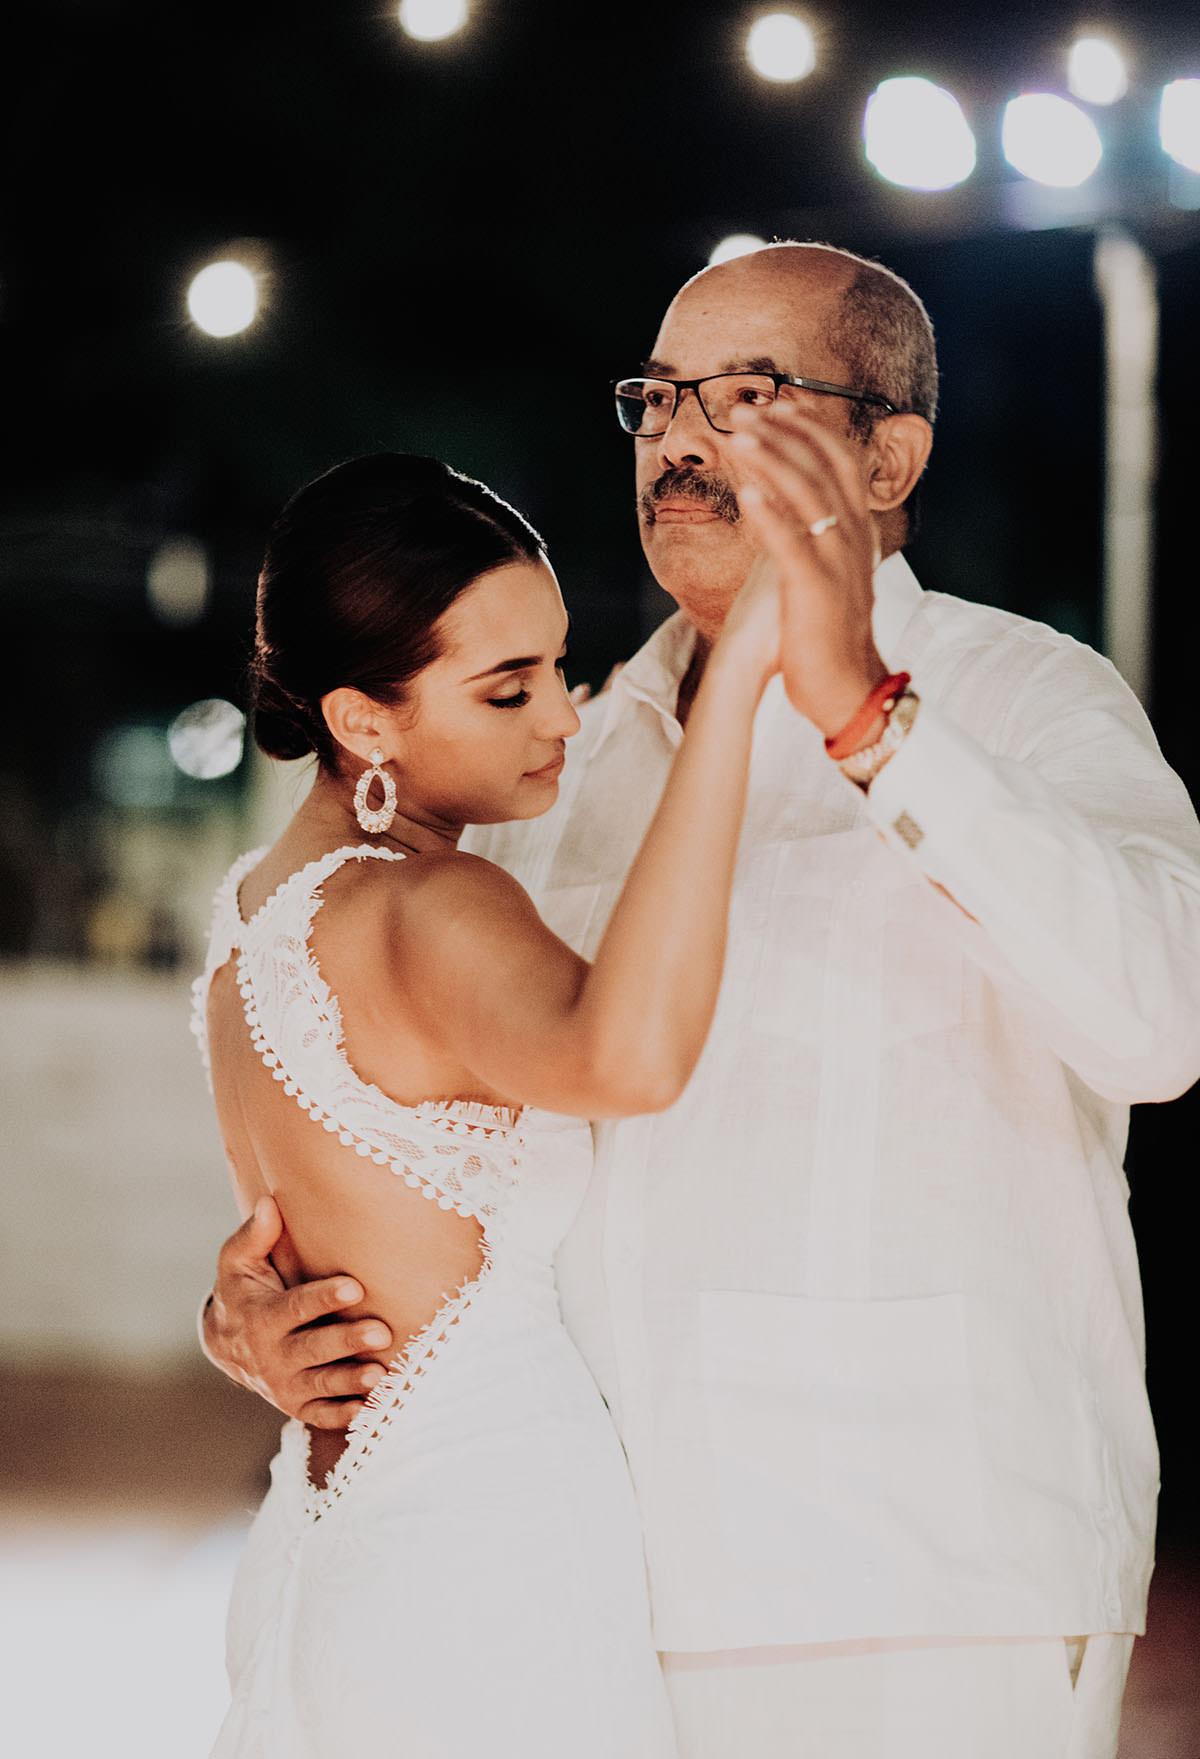 la-hacienda-xcanatun-wedding-merida-mexico-175.jpg